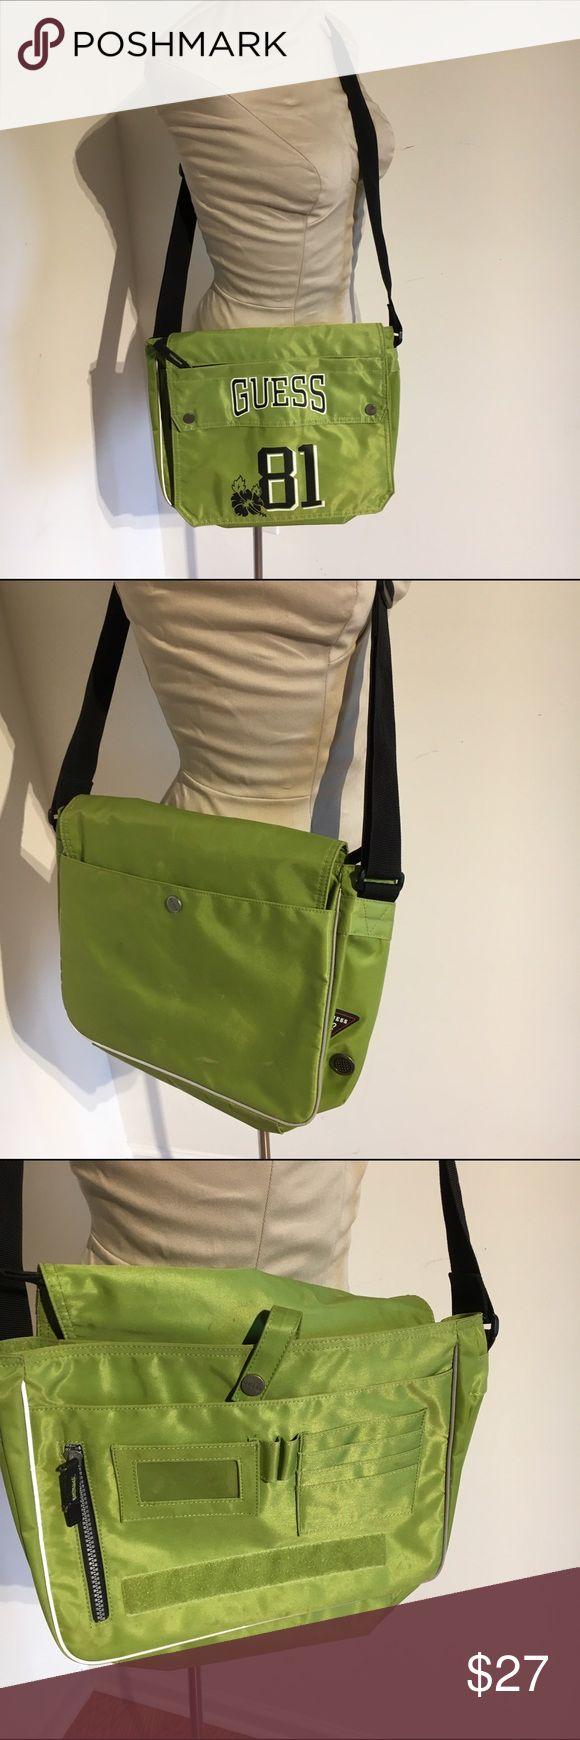 Guess crossbody bag 💼 Super cool lime green crossbody bag with card holder, pen pocket, large interior pocket and back pocket. Guess Bags Crossbody Bags